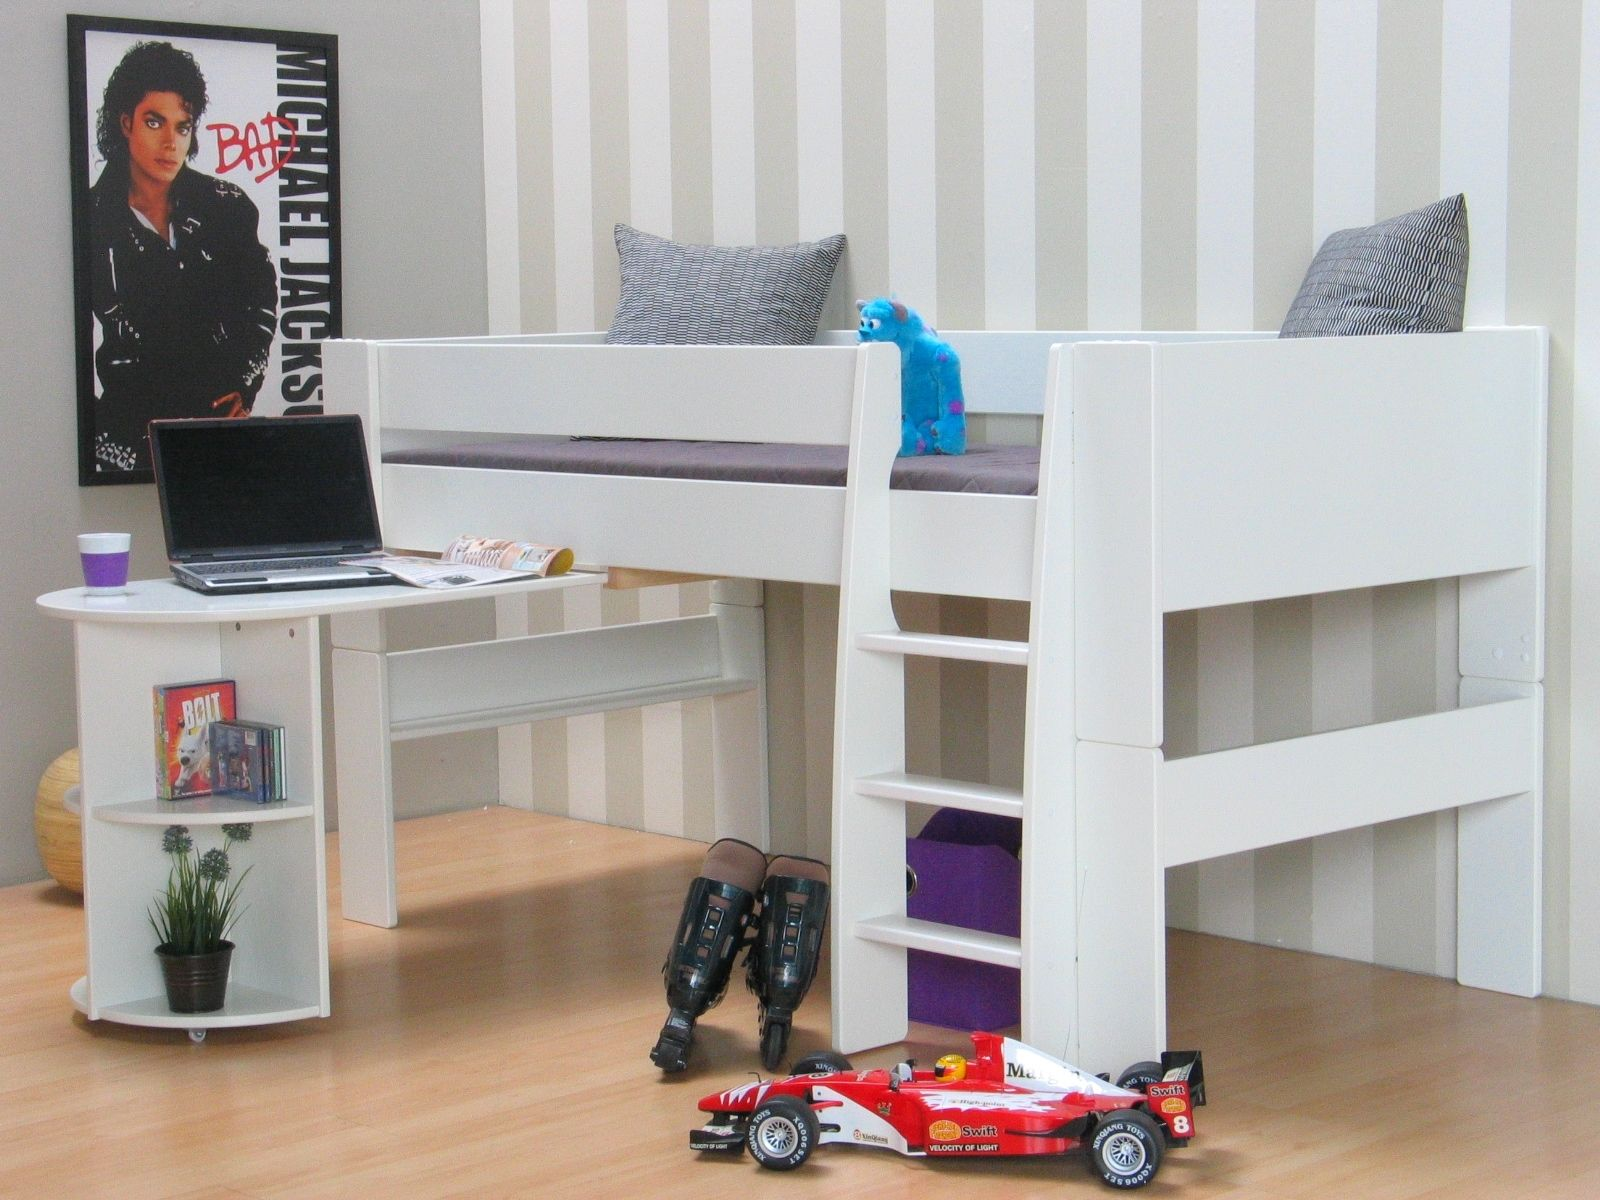 molly kids halbhohes bett 90 x 200 inkl lattenrost bettgestell jugendbett bett m bel wohnen. Black Bedroom Furniture Sets. Home Design Ideas